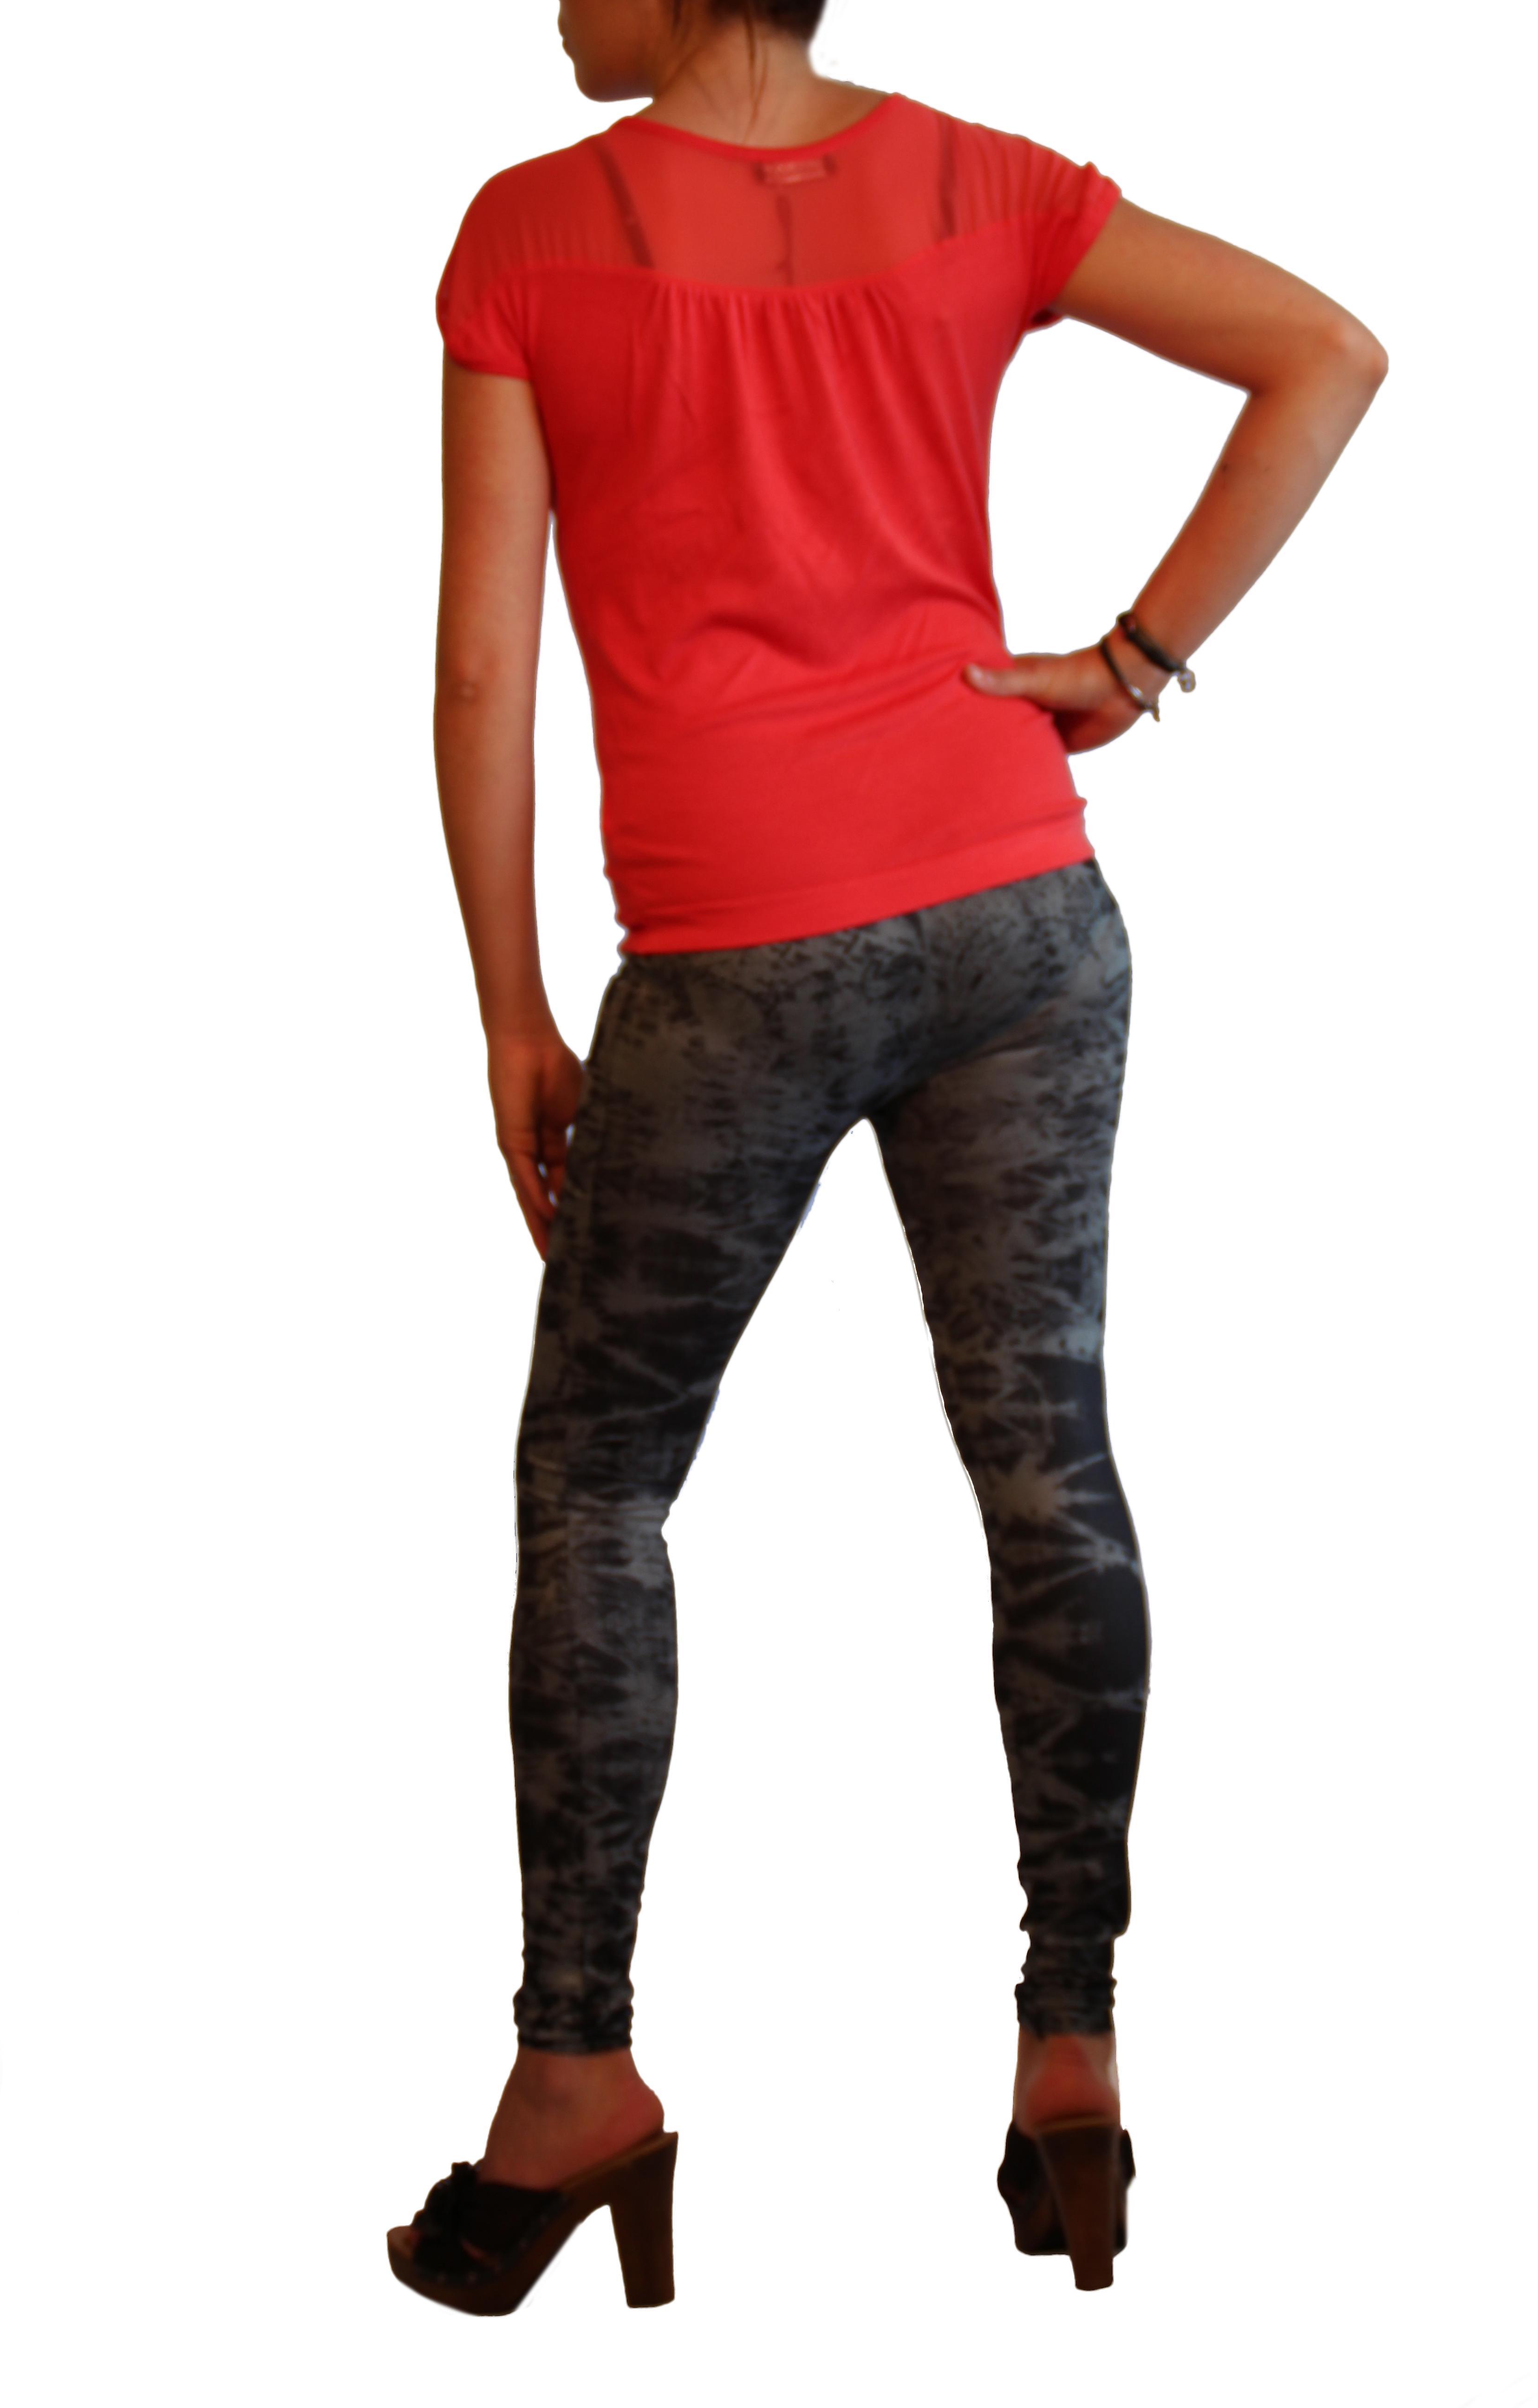 Legging jeans style worn